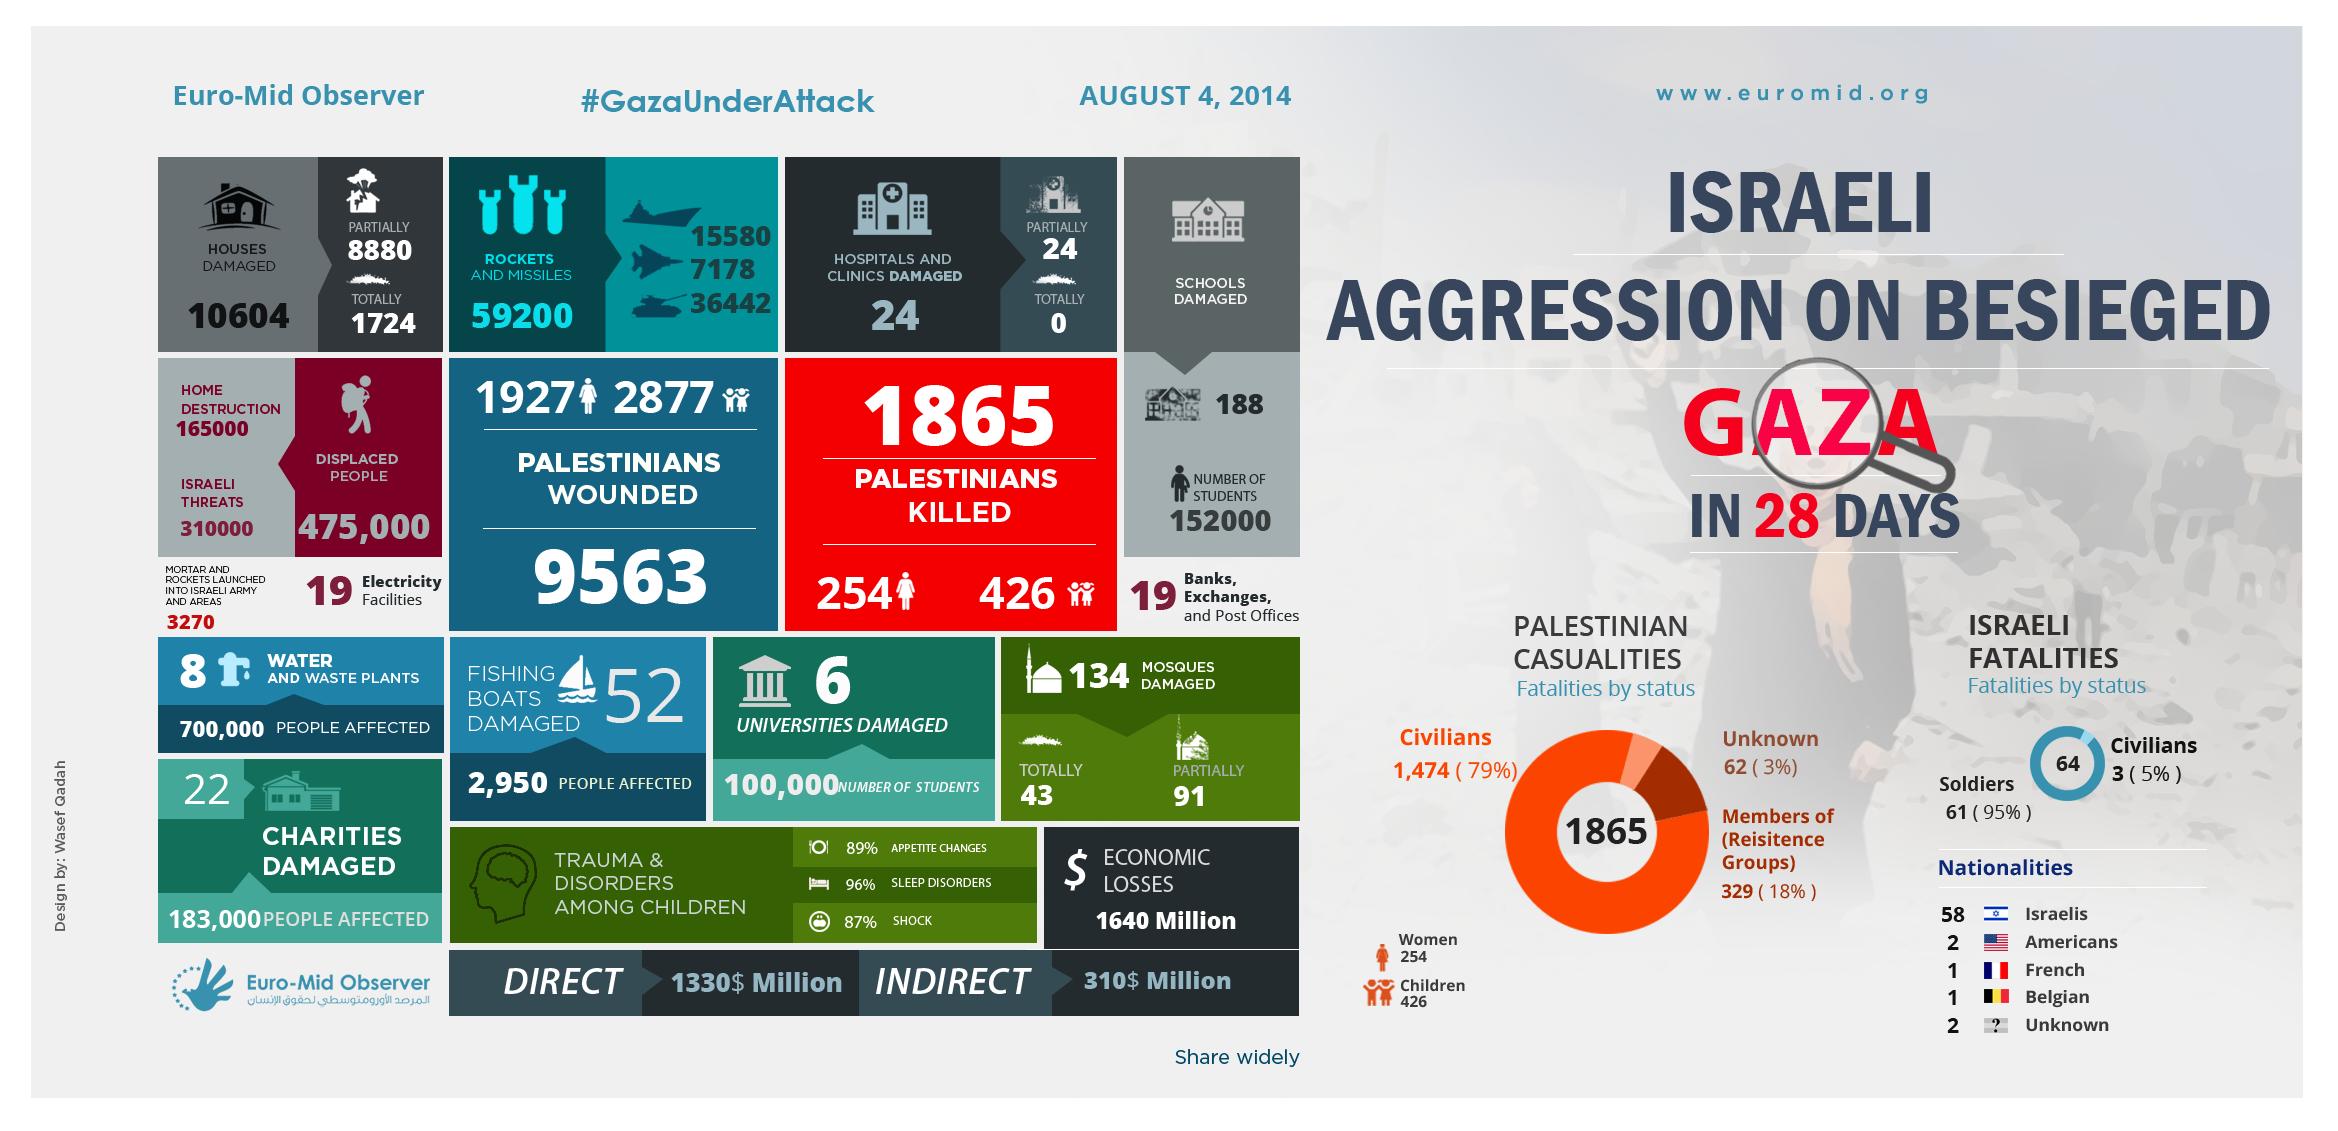 Israeli Aggression on besieged Gaza in 28 Days